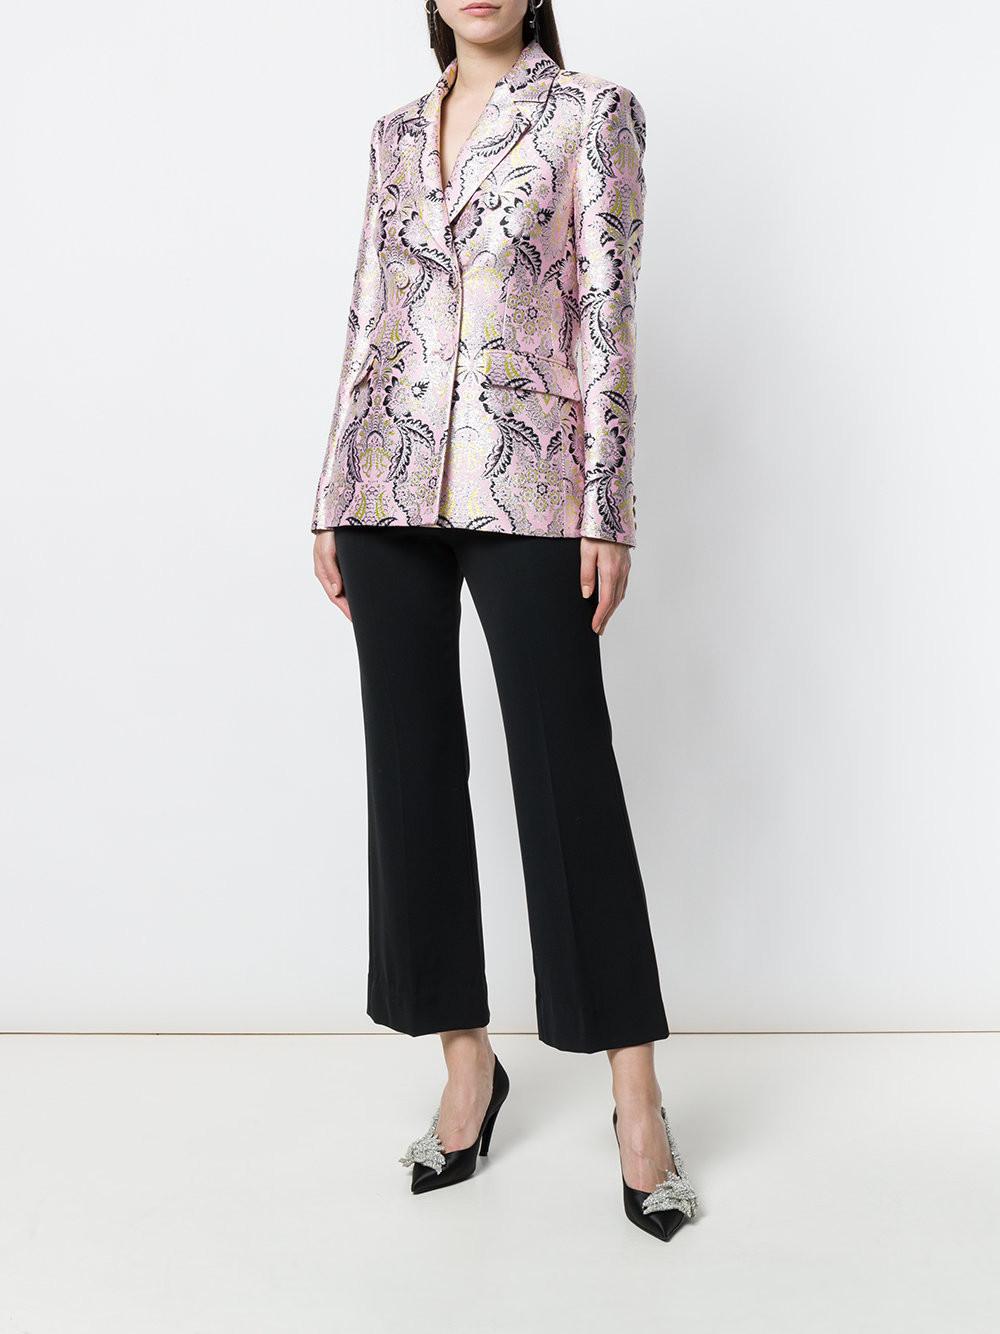 MSGM jacquard fitted blazer $591